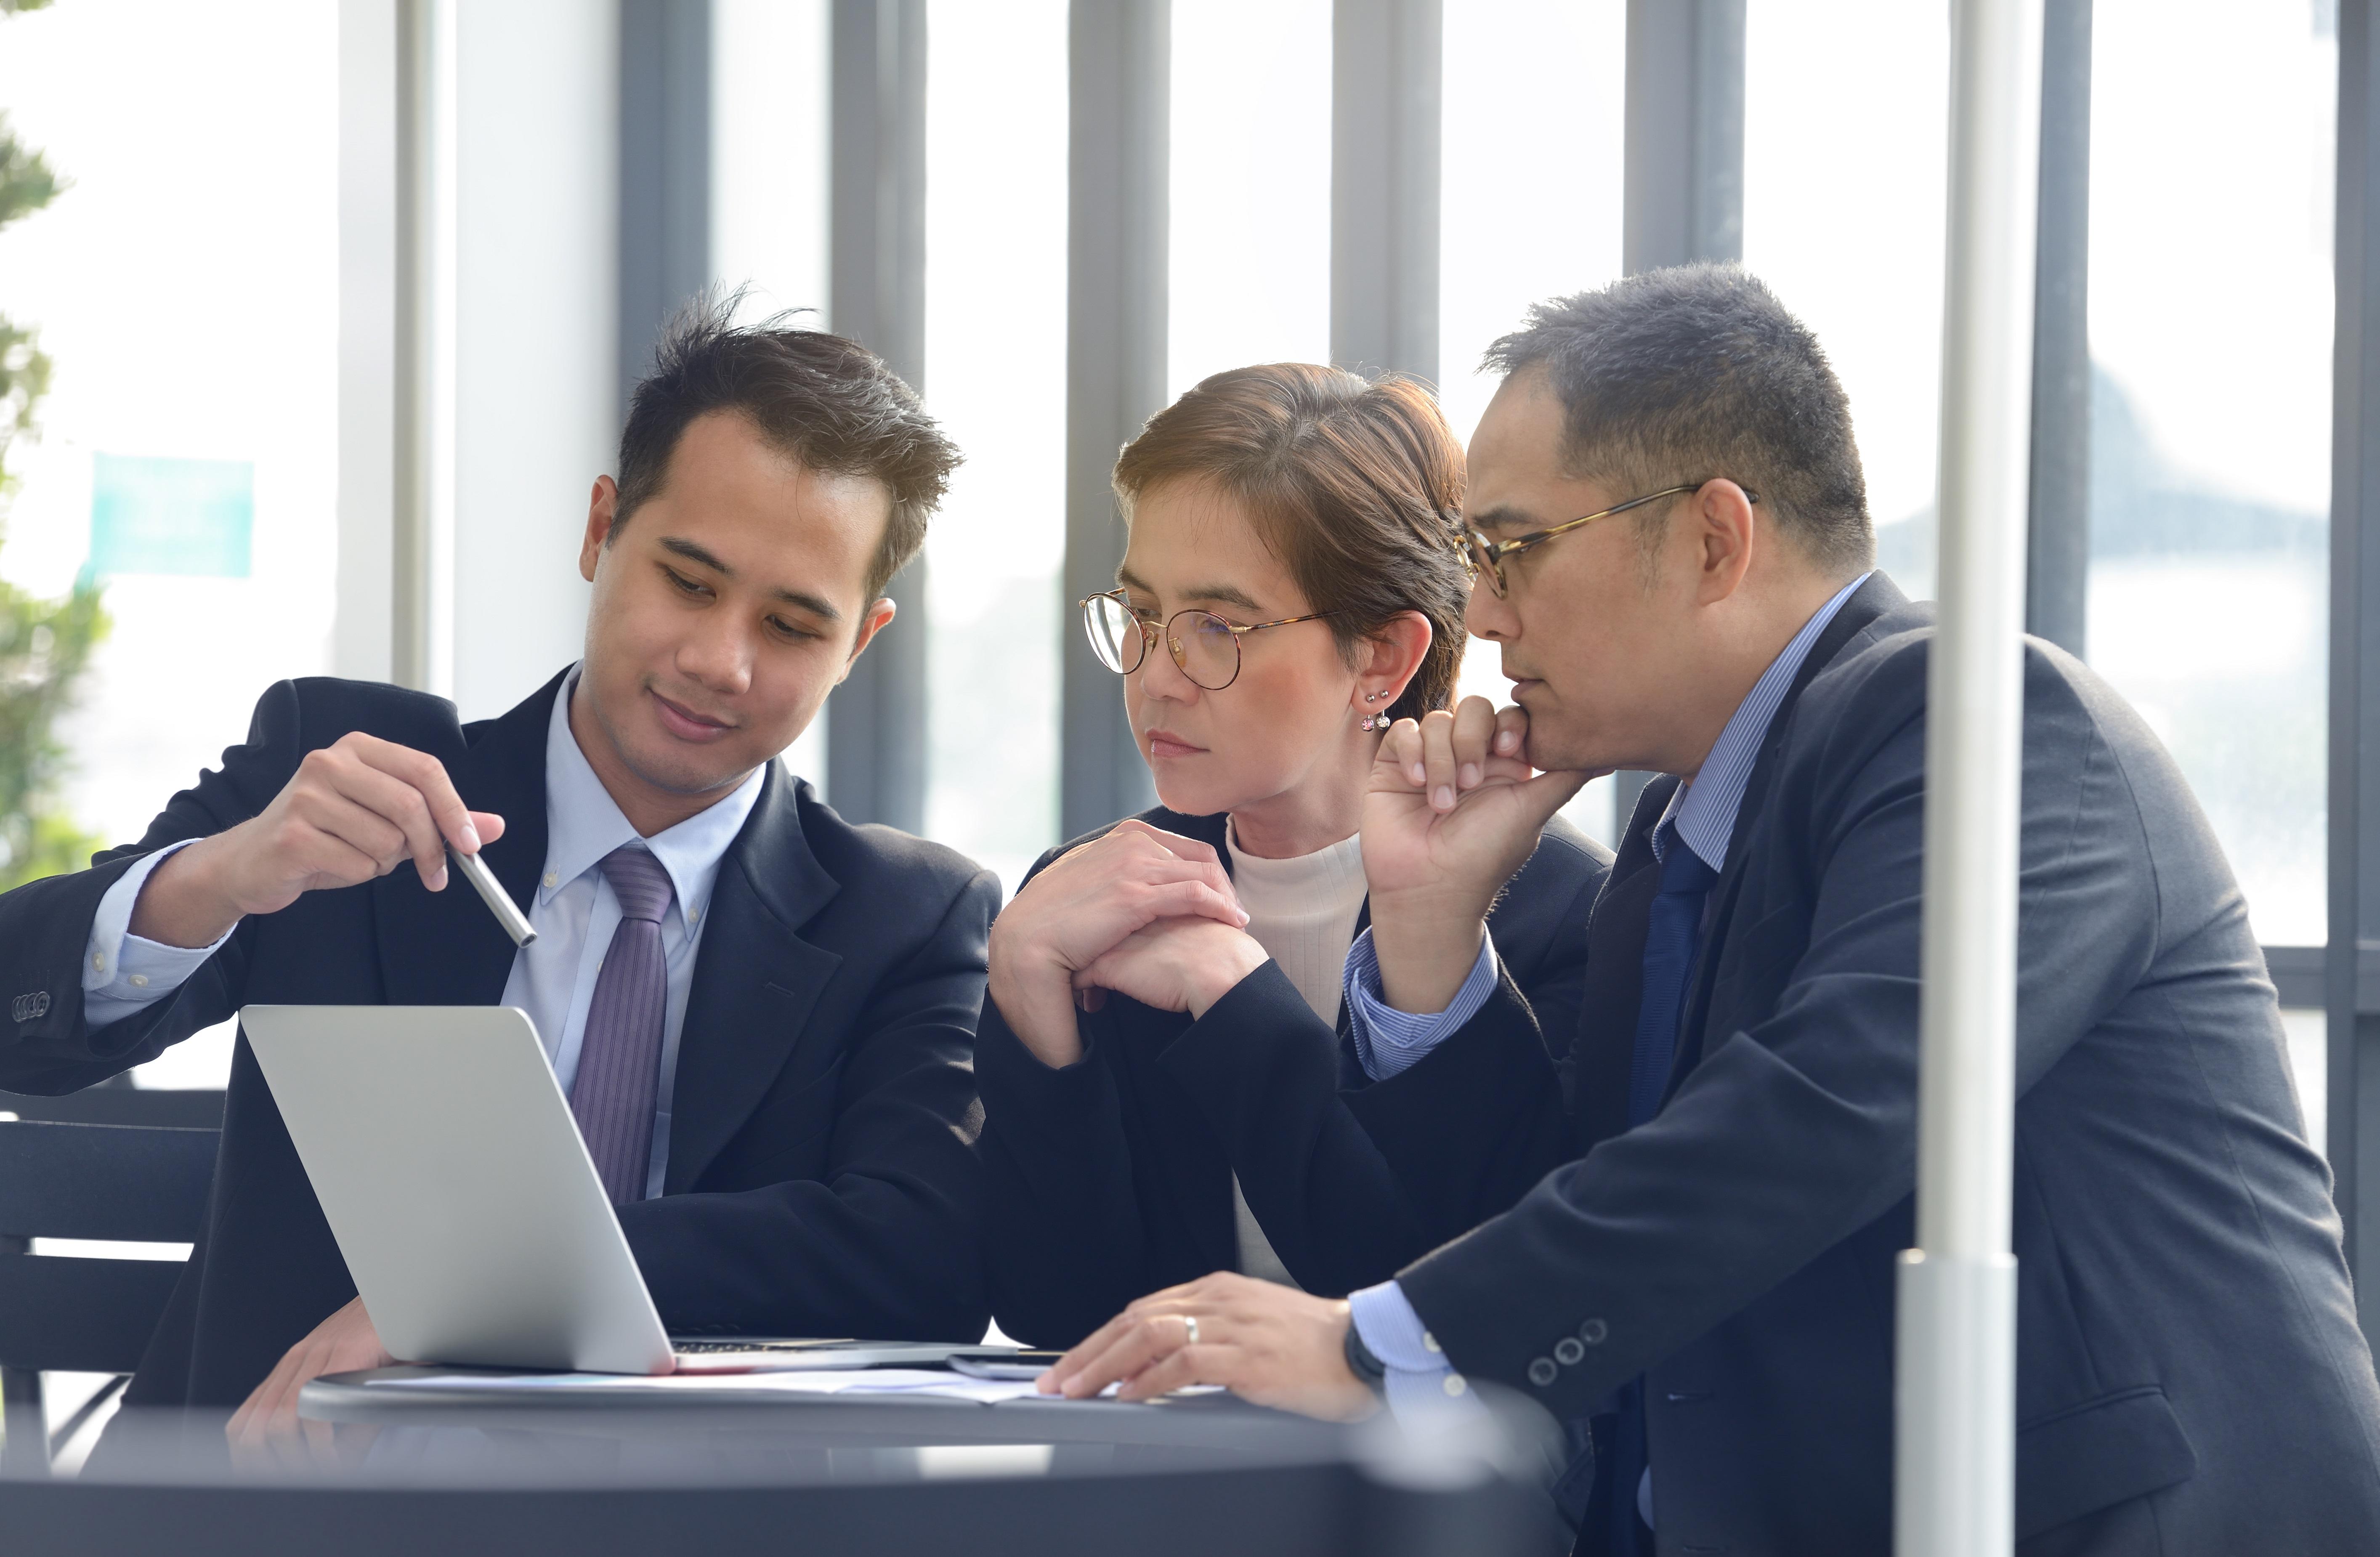 Best Digital Marketing Agency Search Tips 6 : Case Studies